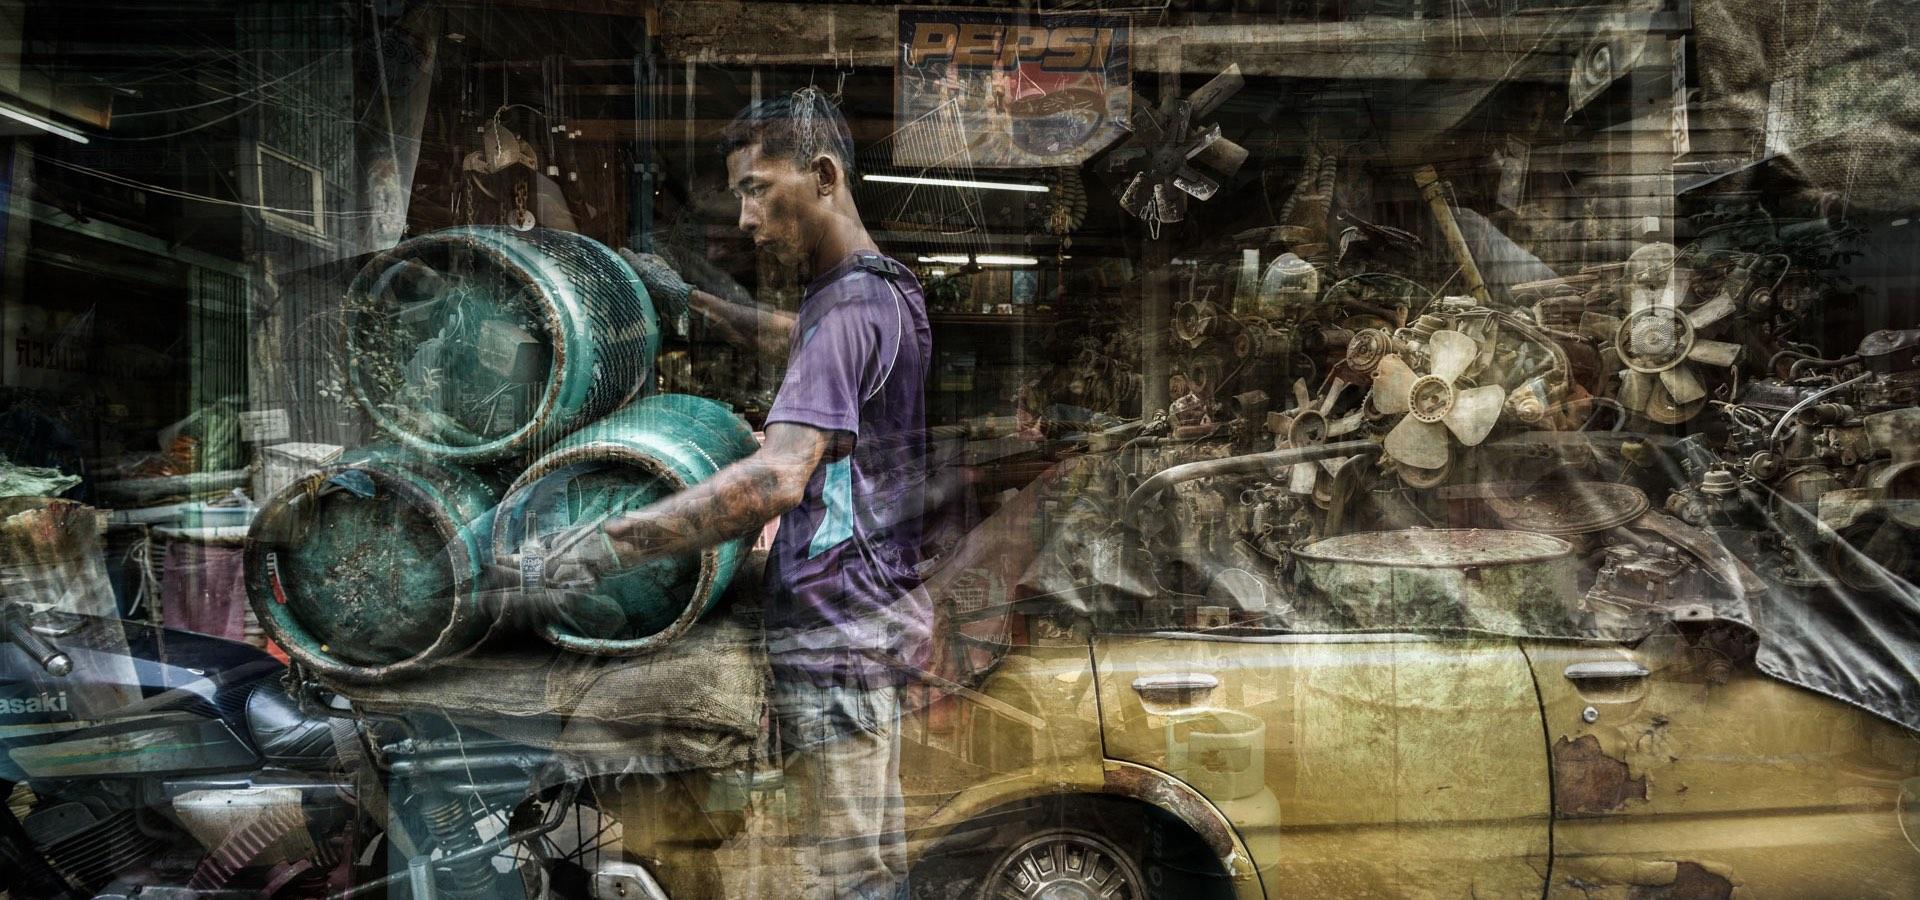 Riccardo Magherini Fine Art Photography- Pah Klong